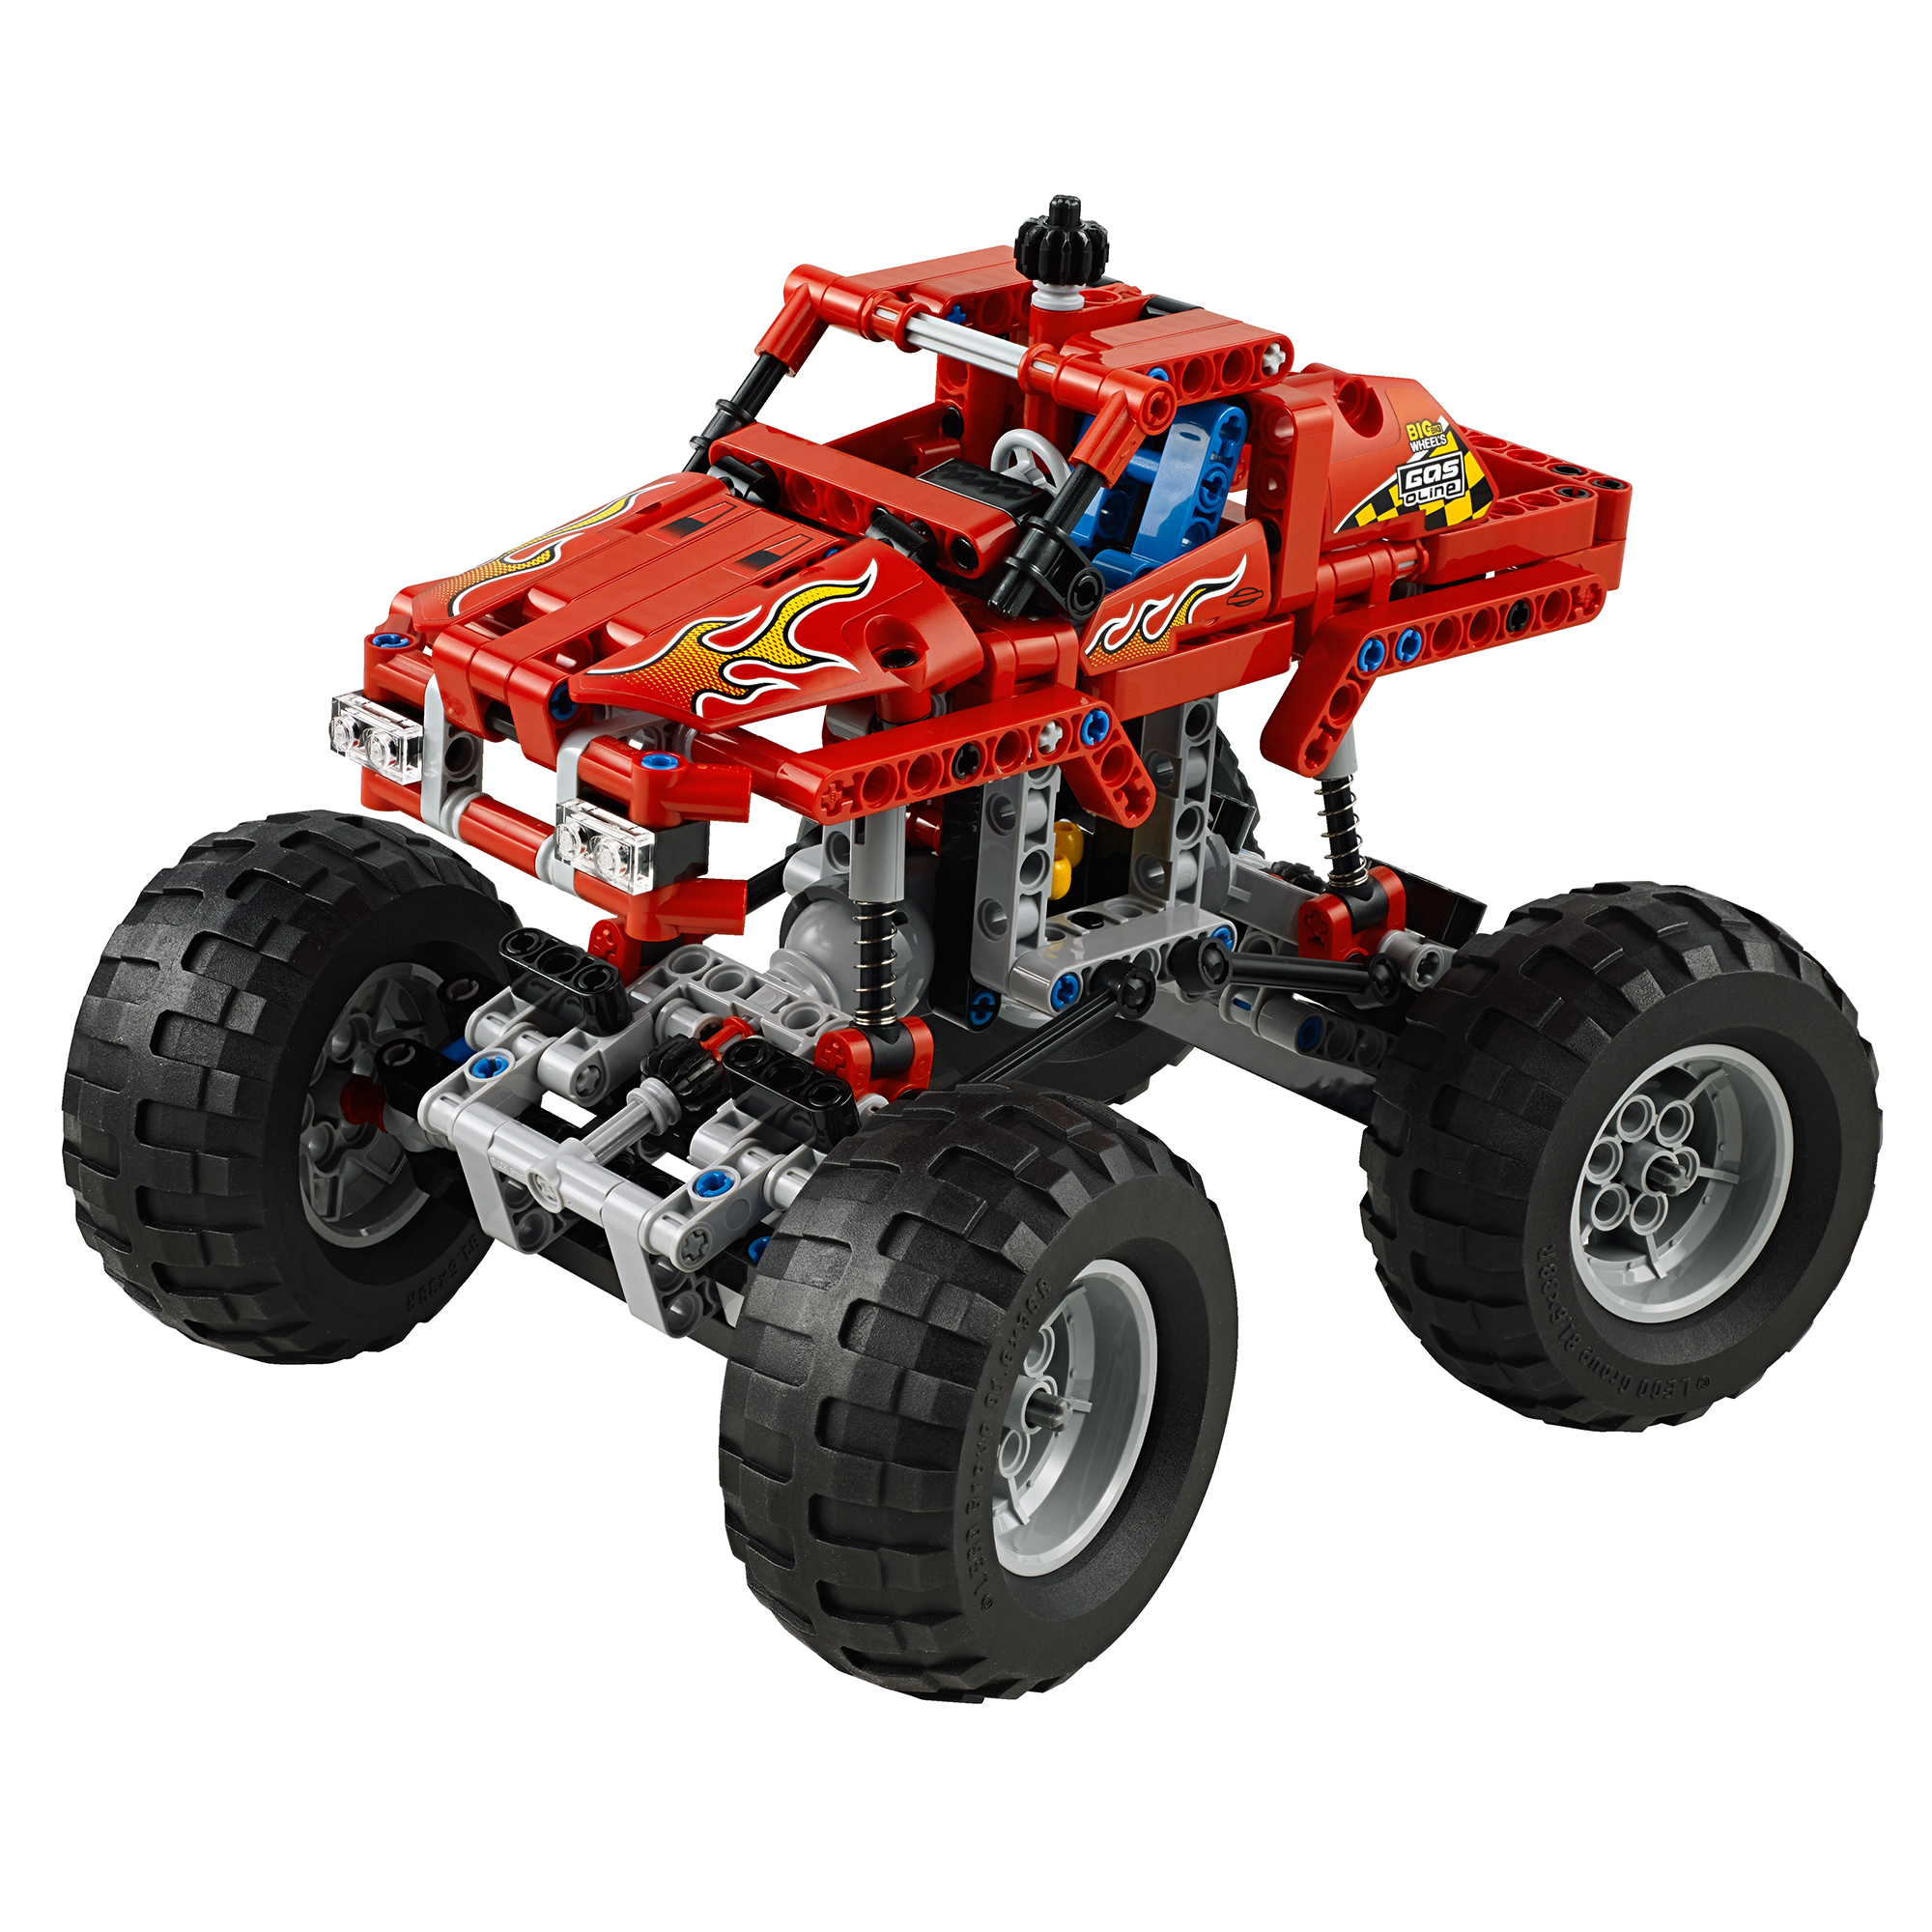 LEGO Technic Monster Truck 42005 - Children's Birthday Your Kids Bday - 10th Birthday